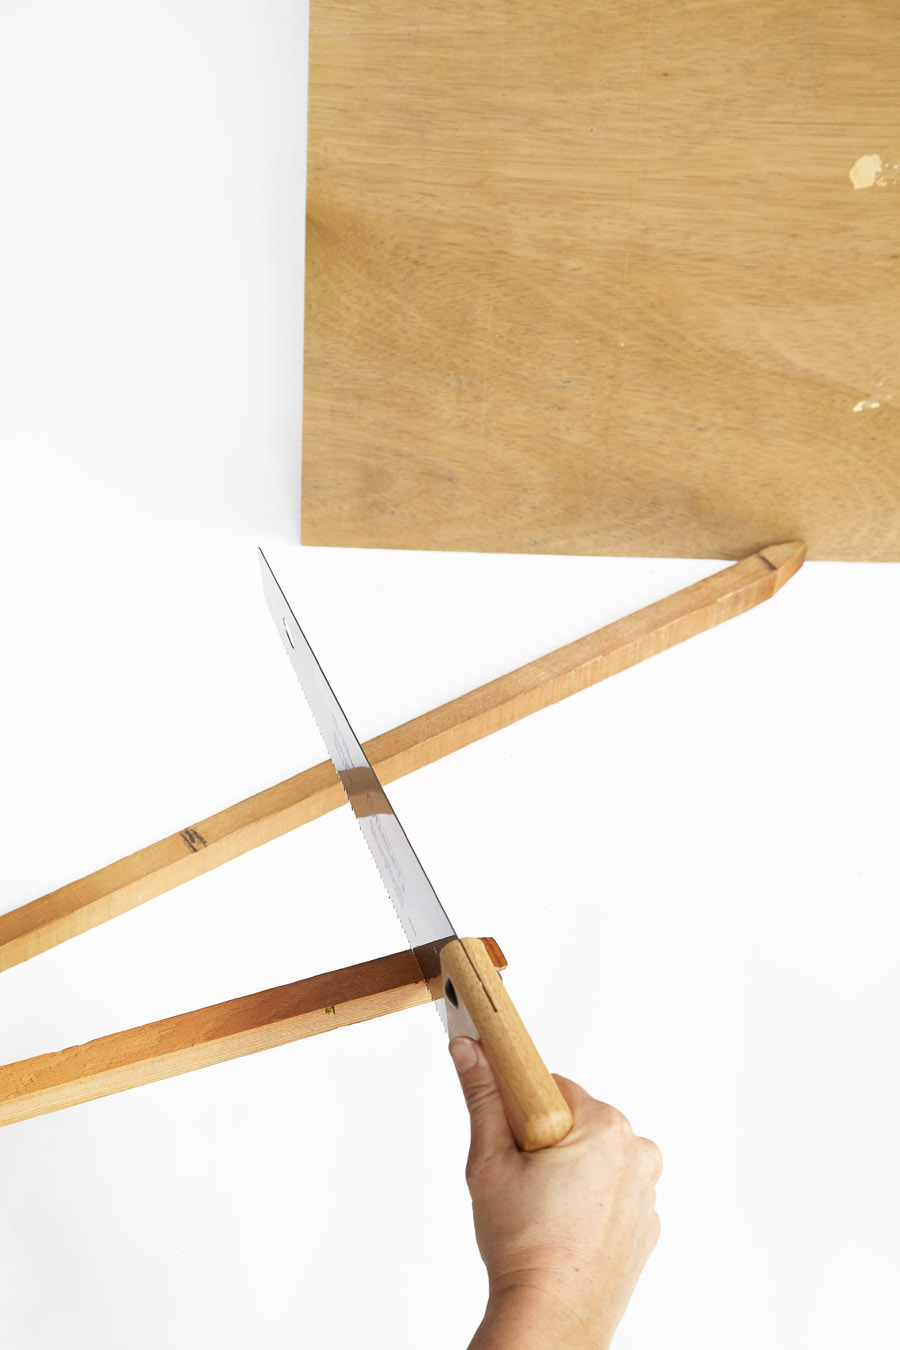 4-faca-voce-mesmo-jardim-vertical-para-decorar-a-casa